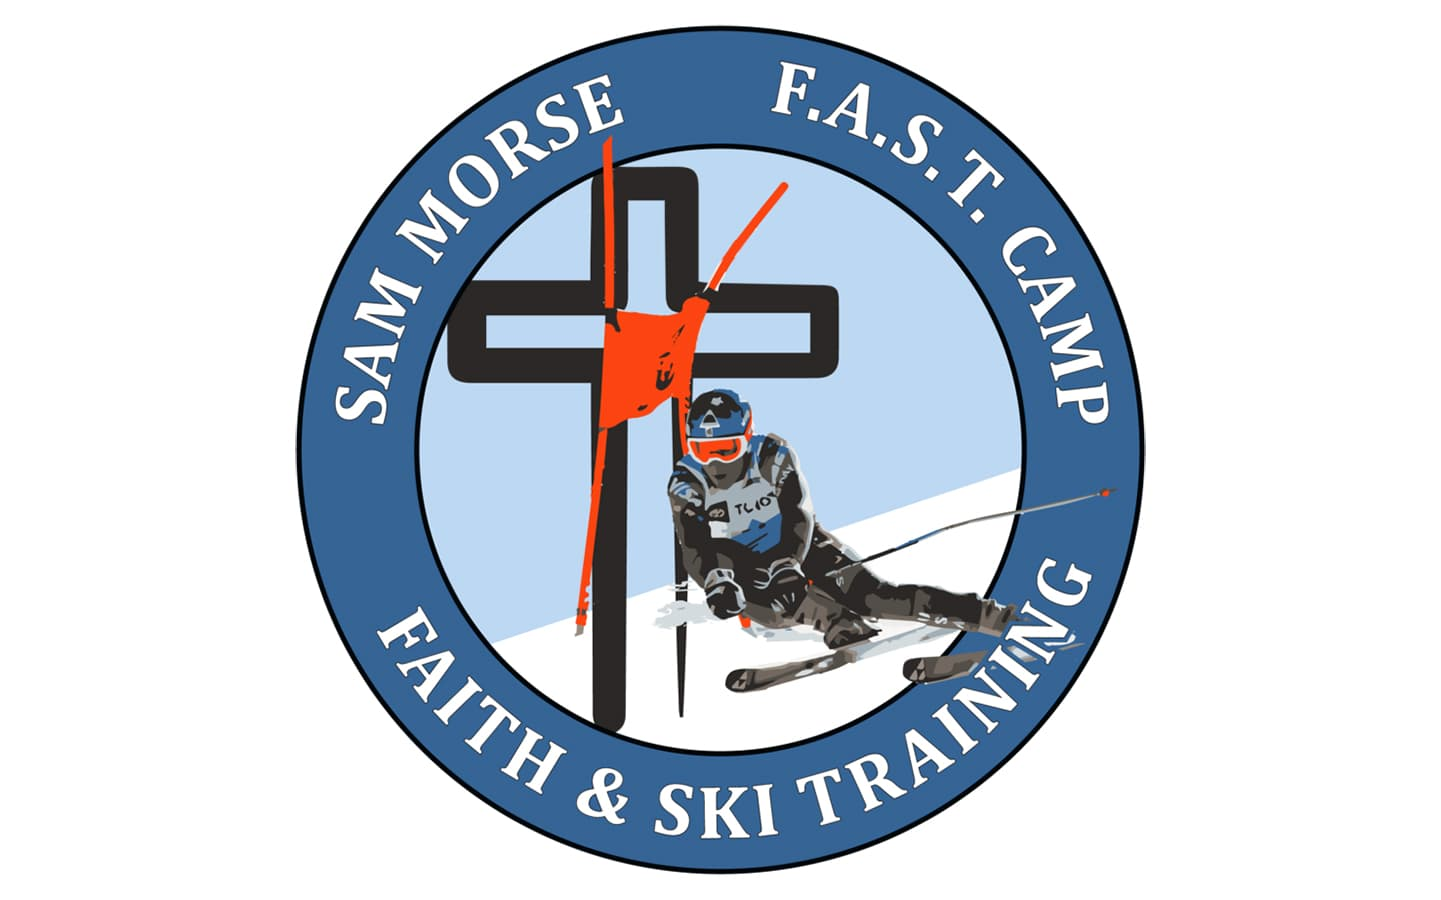 Faith and Ski Training Camp